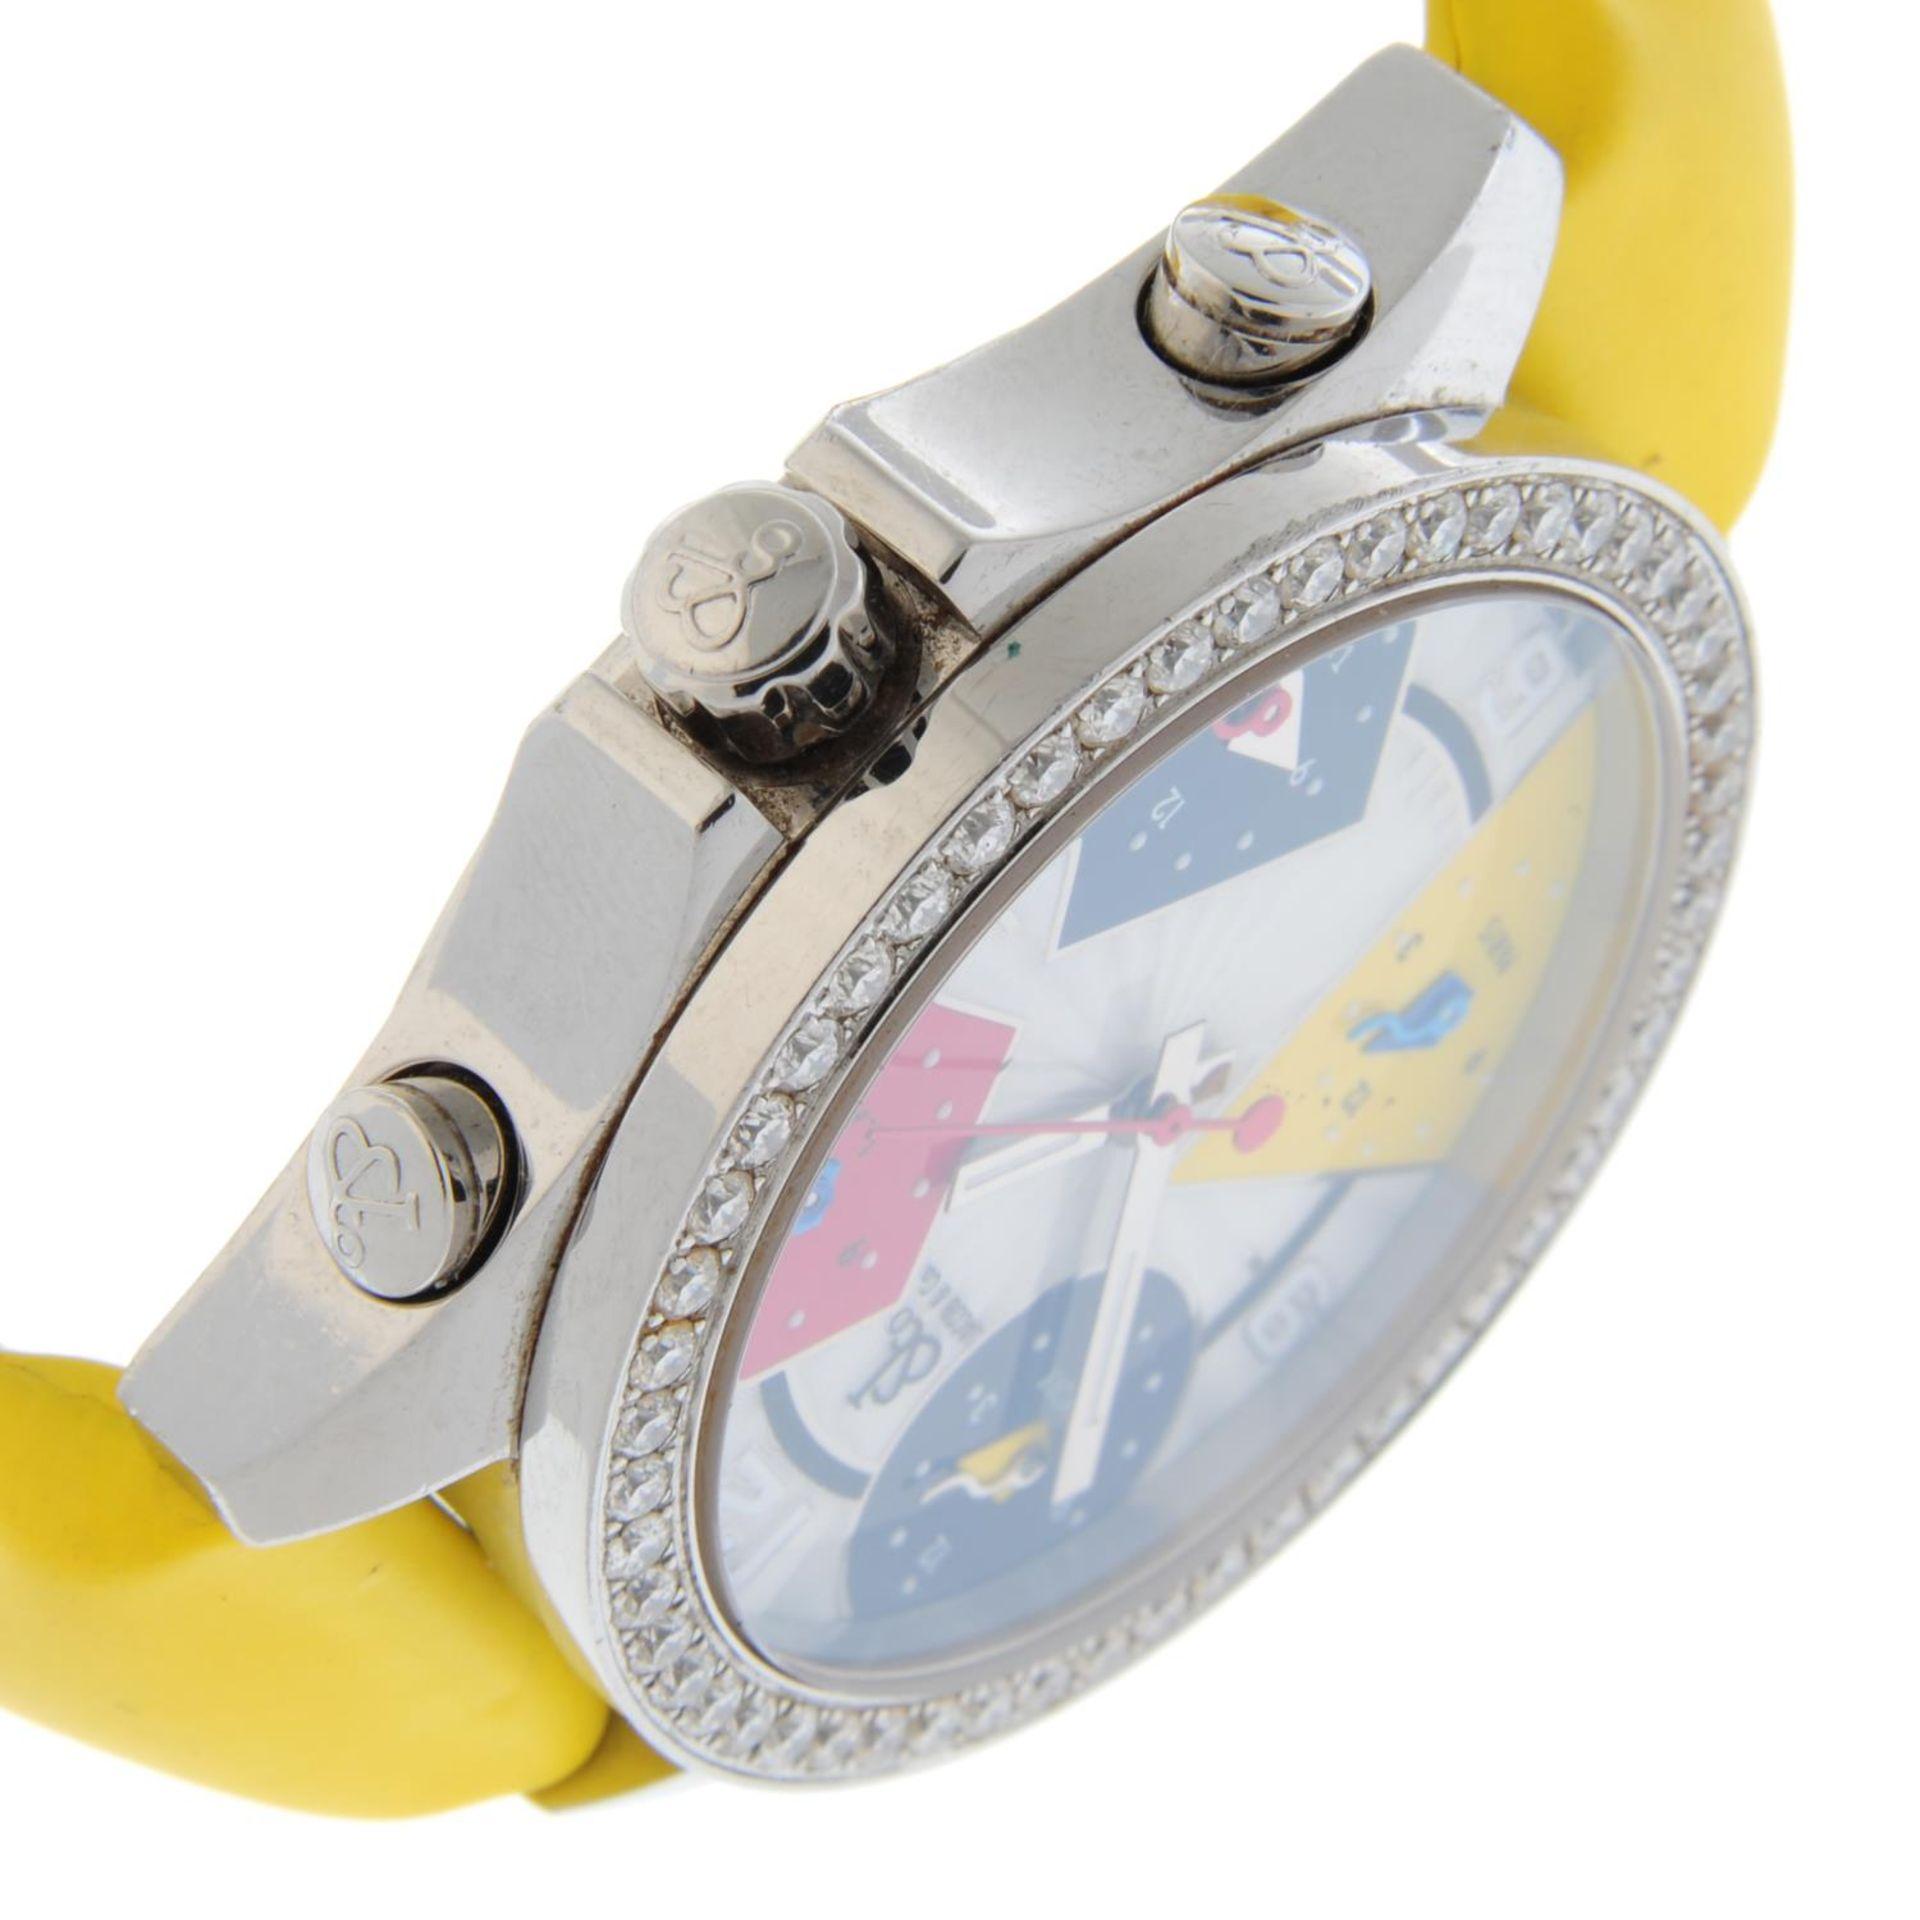 JACOB & CO. - a Five Time Zone wrist watch. - Bild 5 aus 8